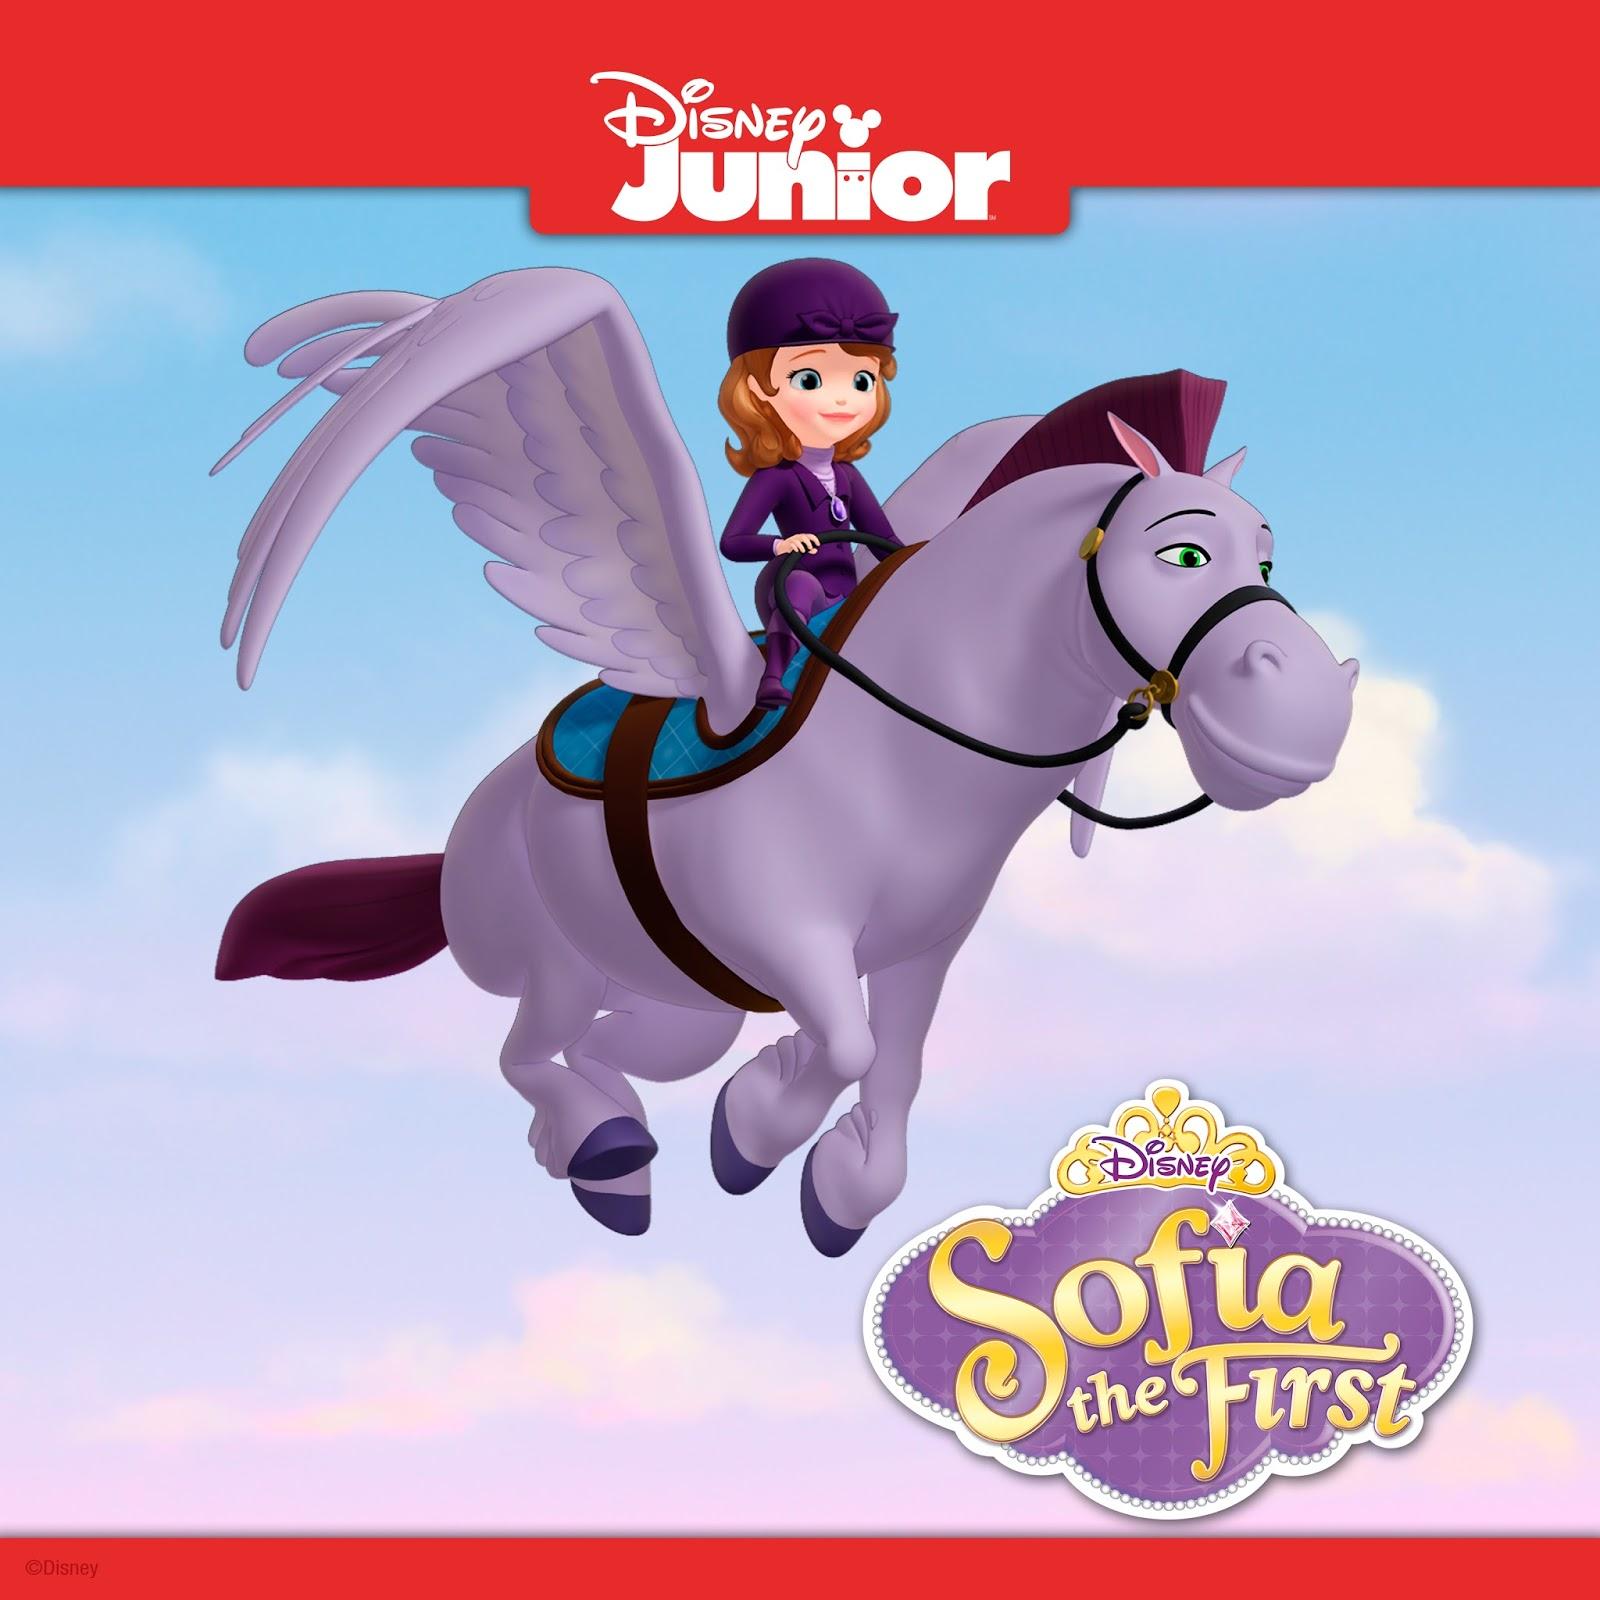 Princesinha Sofia Volume 6 Completo 720pDual  : 100000x100000 999 from www.itunesmaxhd.com size 1600 x 1600 jpeg 234kB